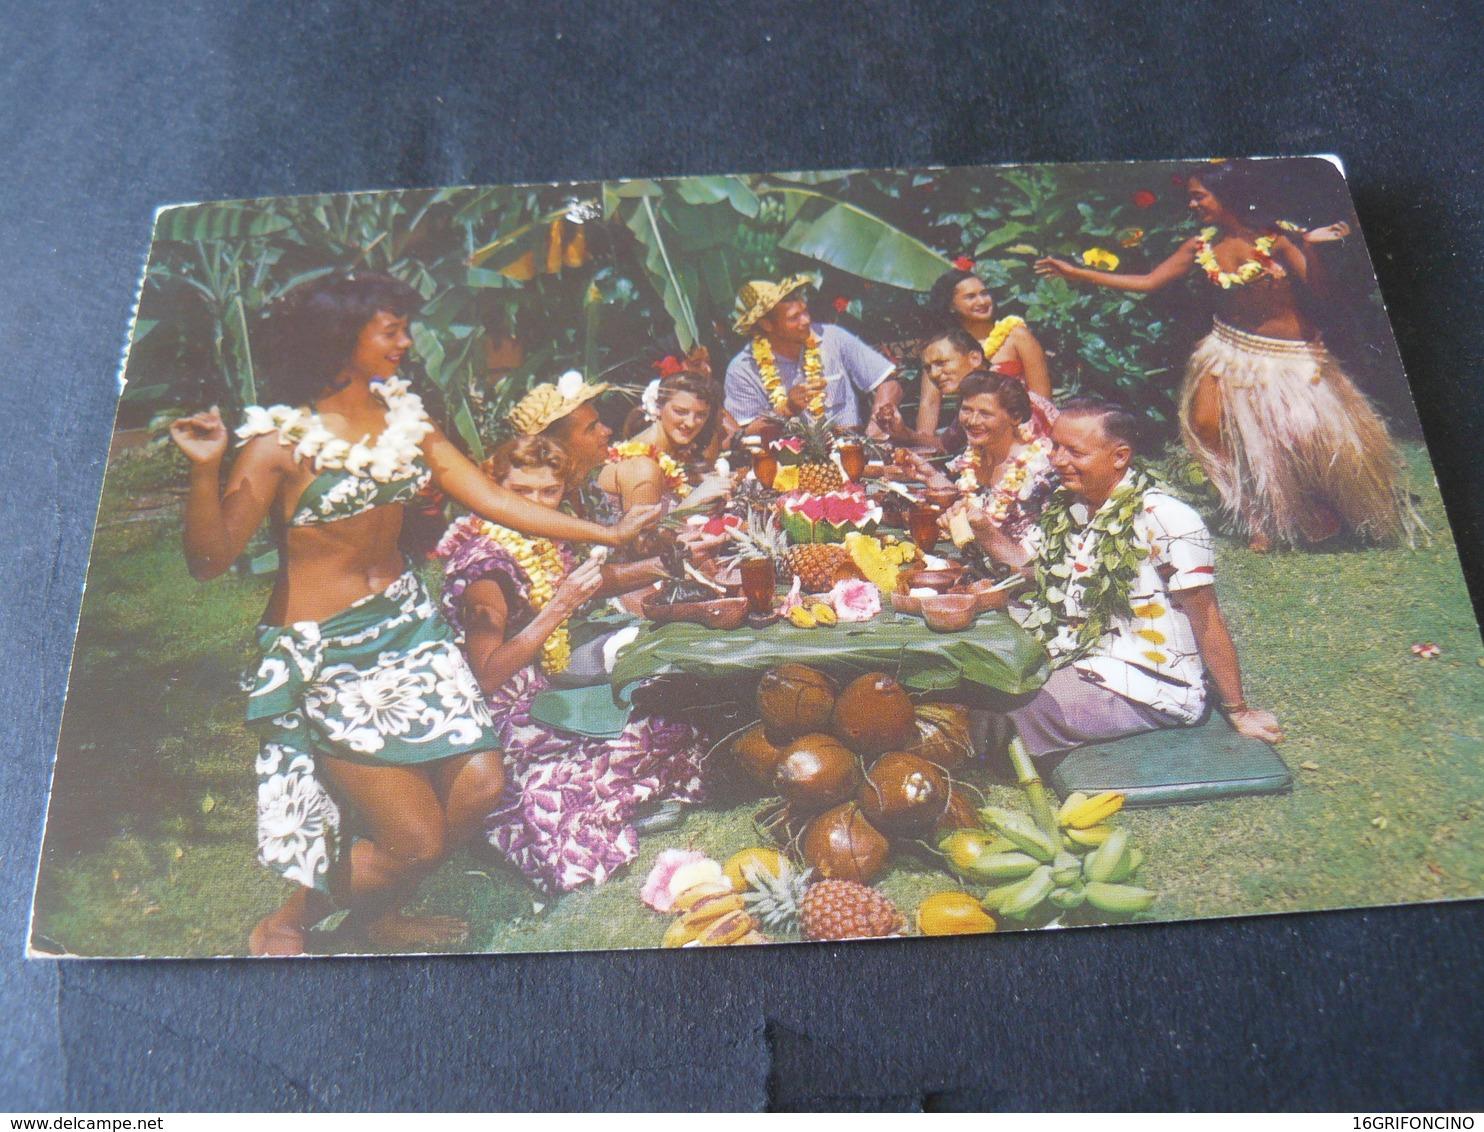 1951 ANCIENT BEAUTIFUL SMALL POSTCARD OF SAMOA  / ANTICA  PICCOLA CARTOLINA  VIAGGIATA DI SAMOA - Samoa Americana